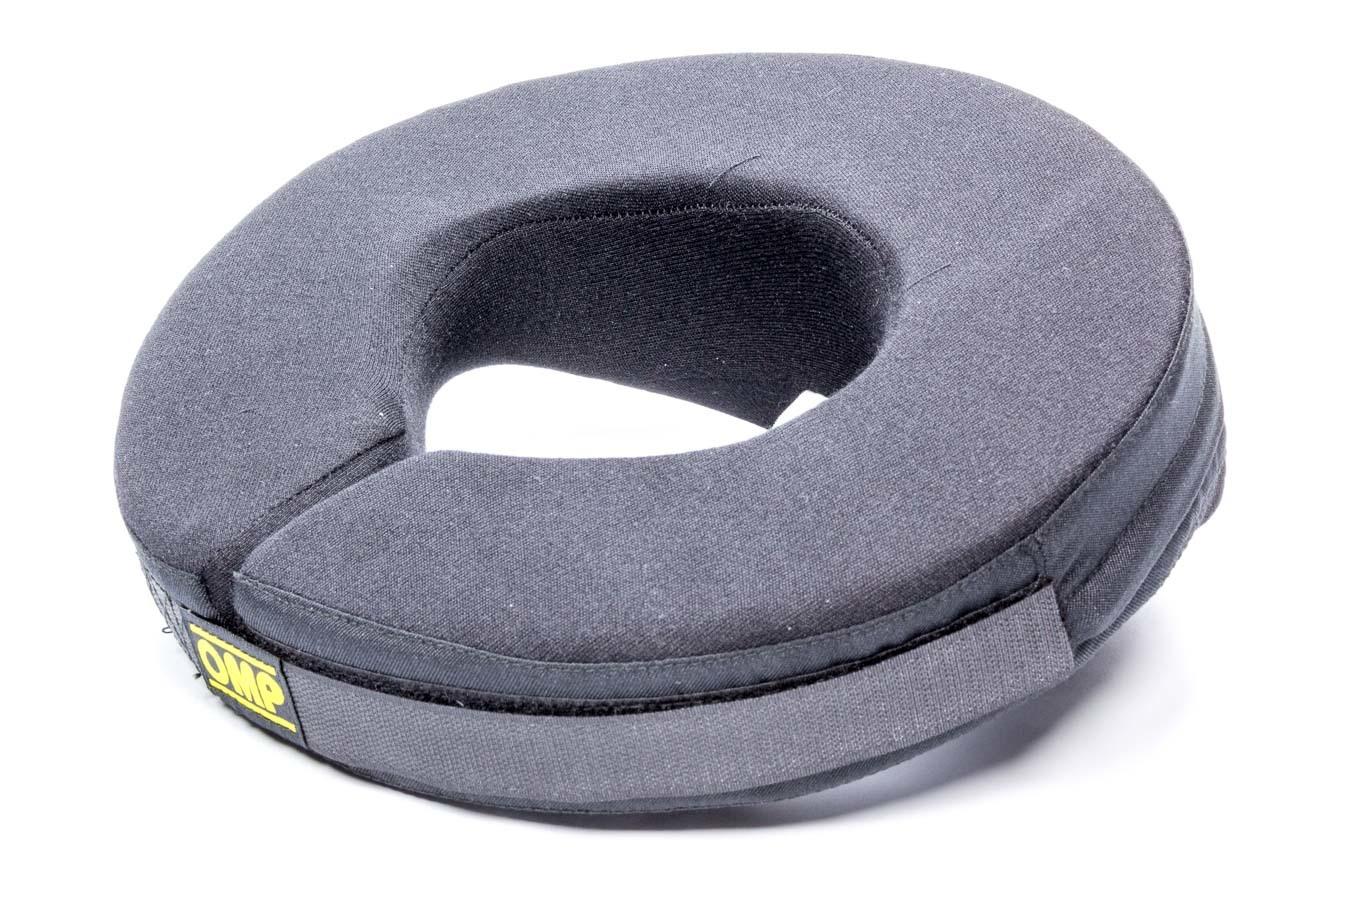 Omp Racing, Inc. Anatomic Neck Collar In Black Nomex